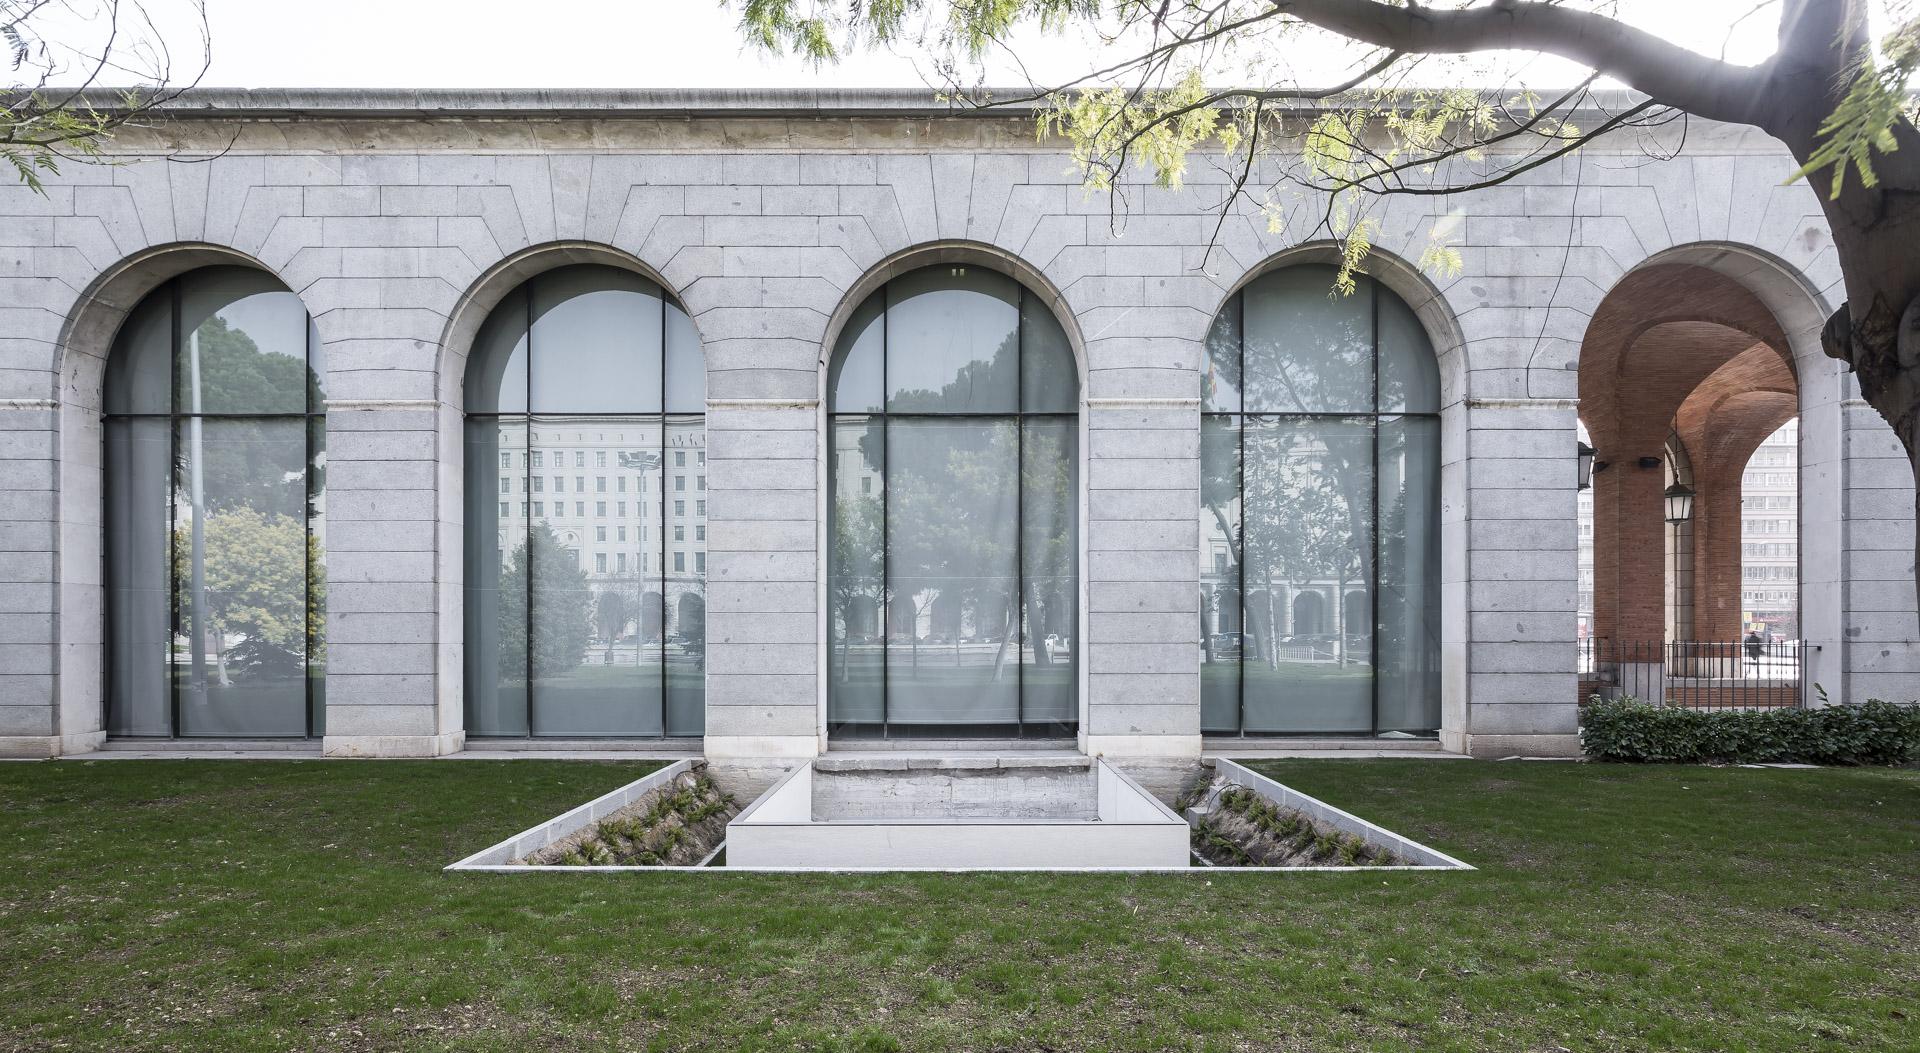 fotografia-arquitectura-madrid-nuevos-ministerios-elorza-german-cabo-02